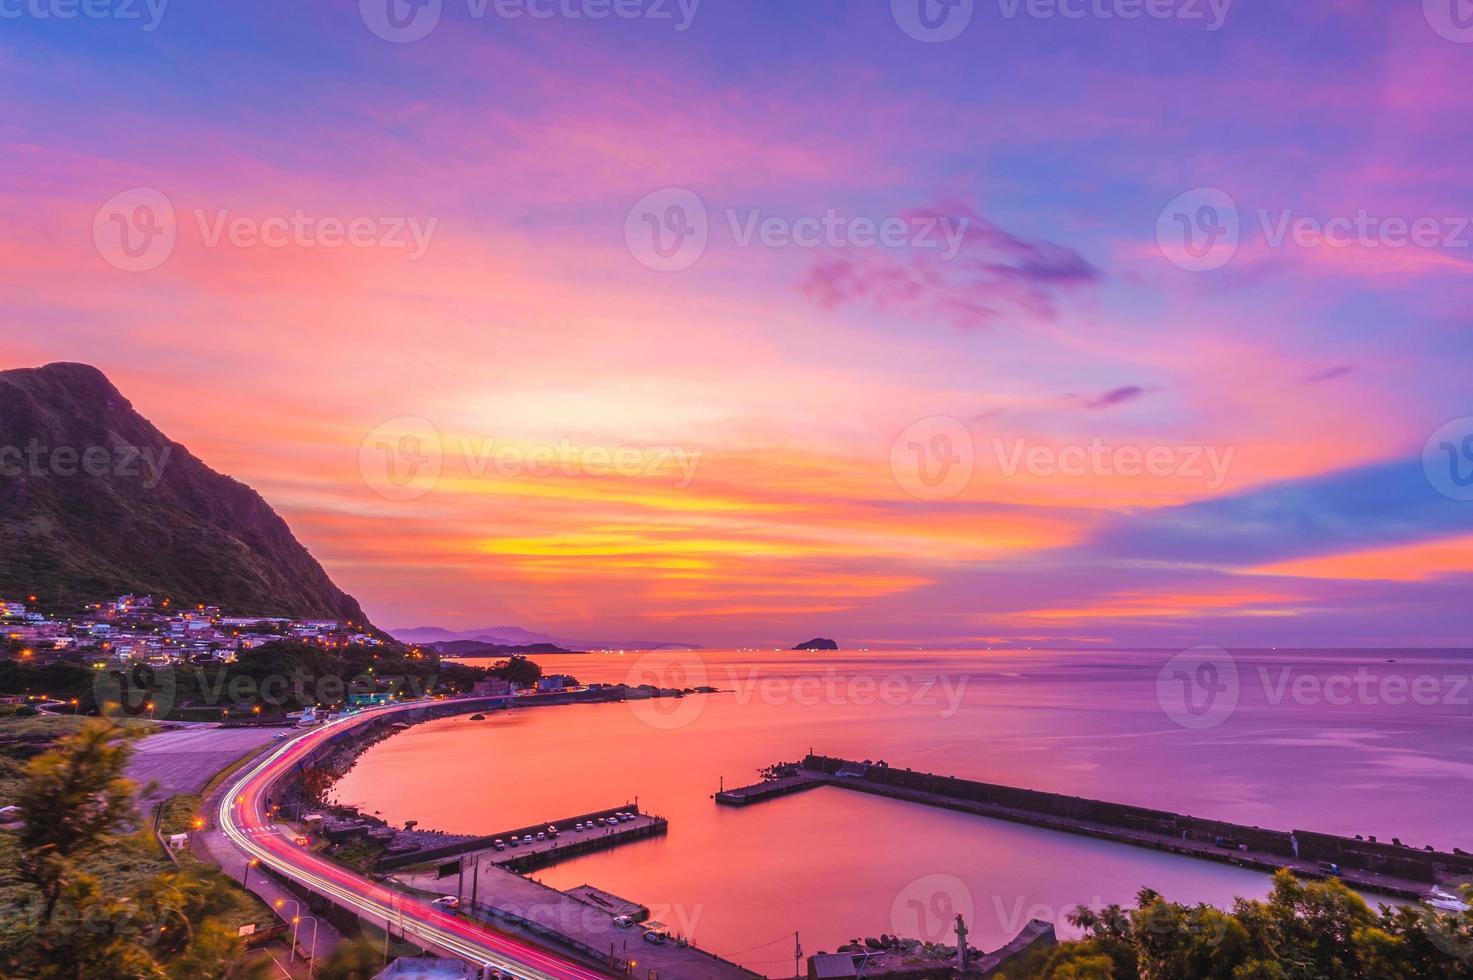 Vista nocturna de la costa norte de New Taipei, Taiwán. foto